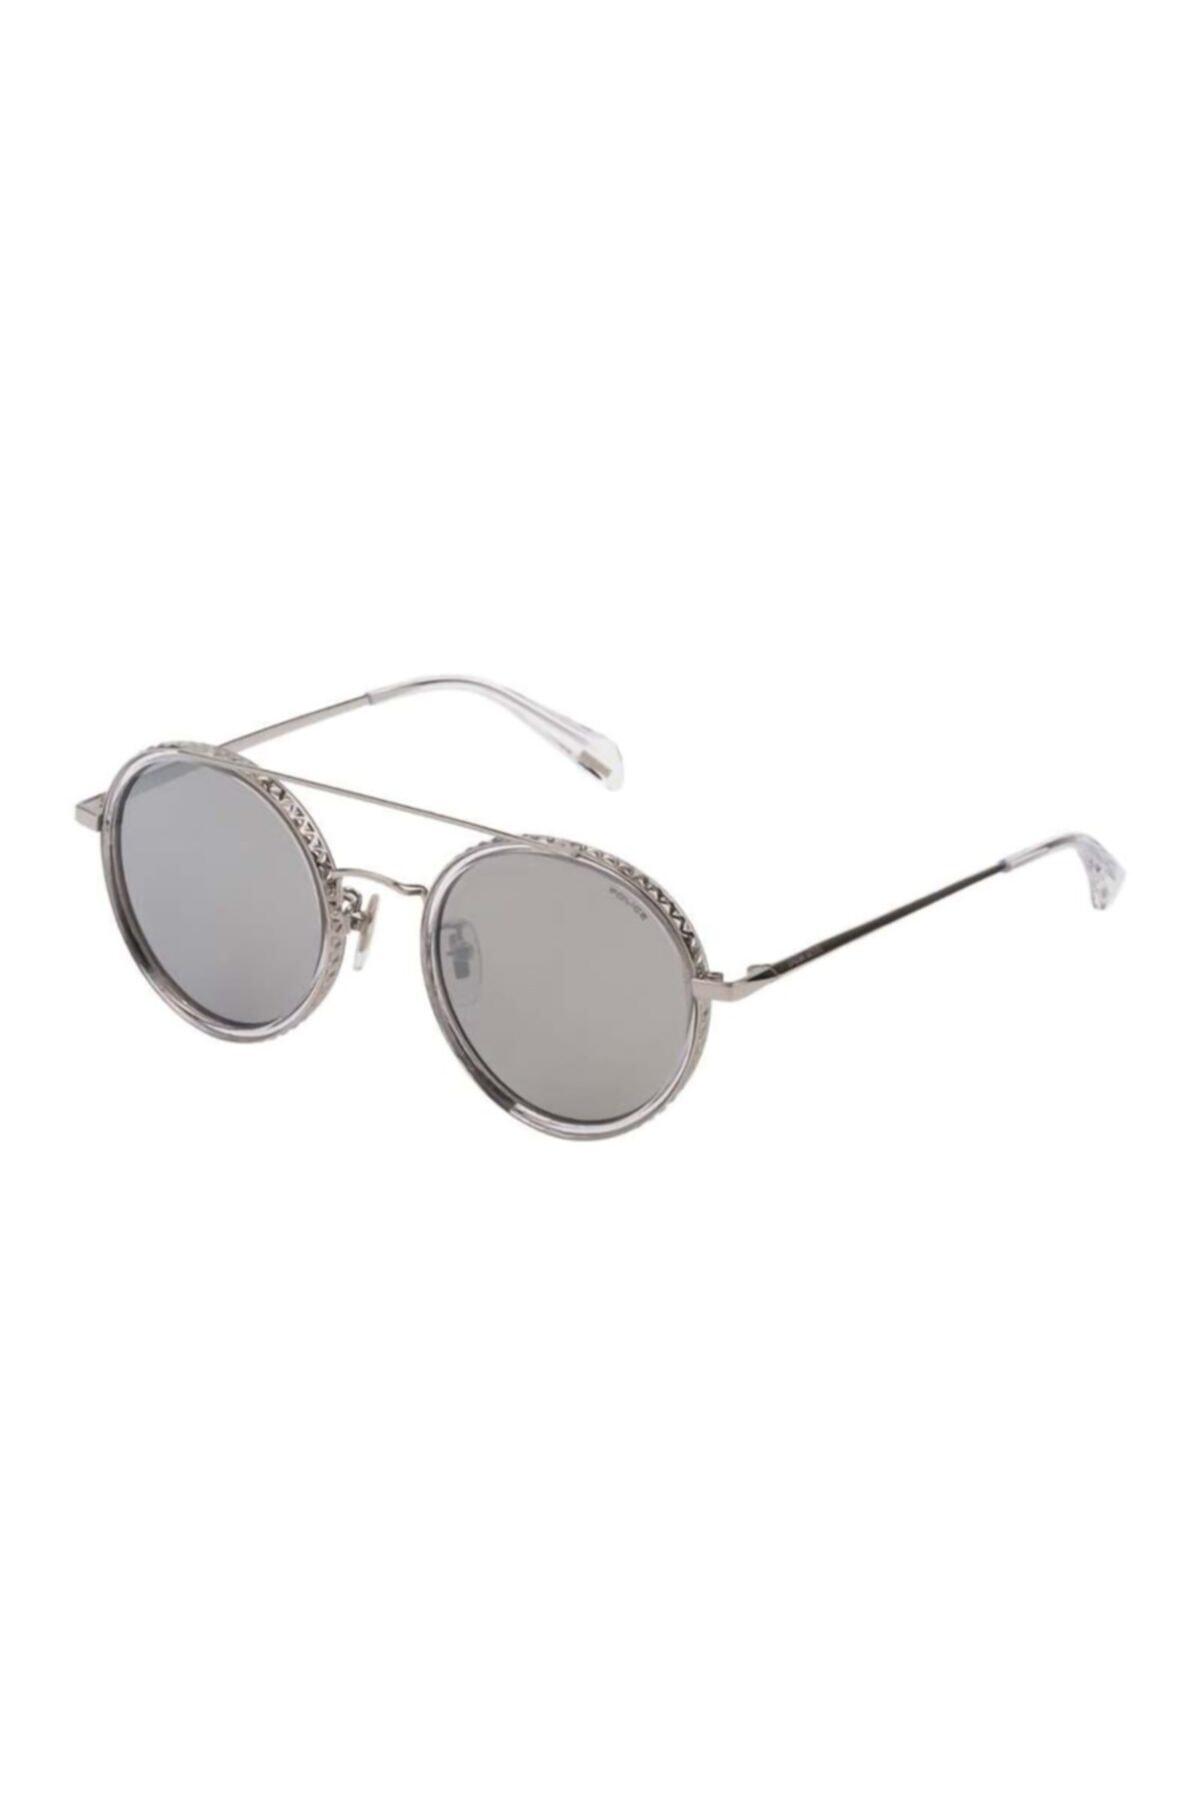 خرید مستقیم عینک آفتابی جدید برند Police رنگ متالیک کد ty50112665